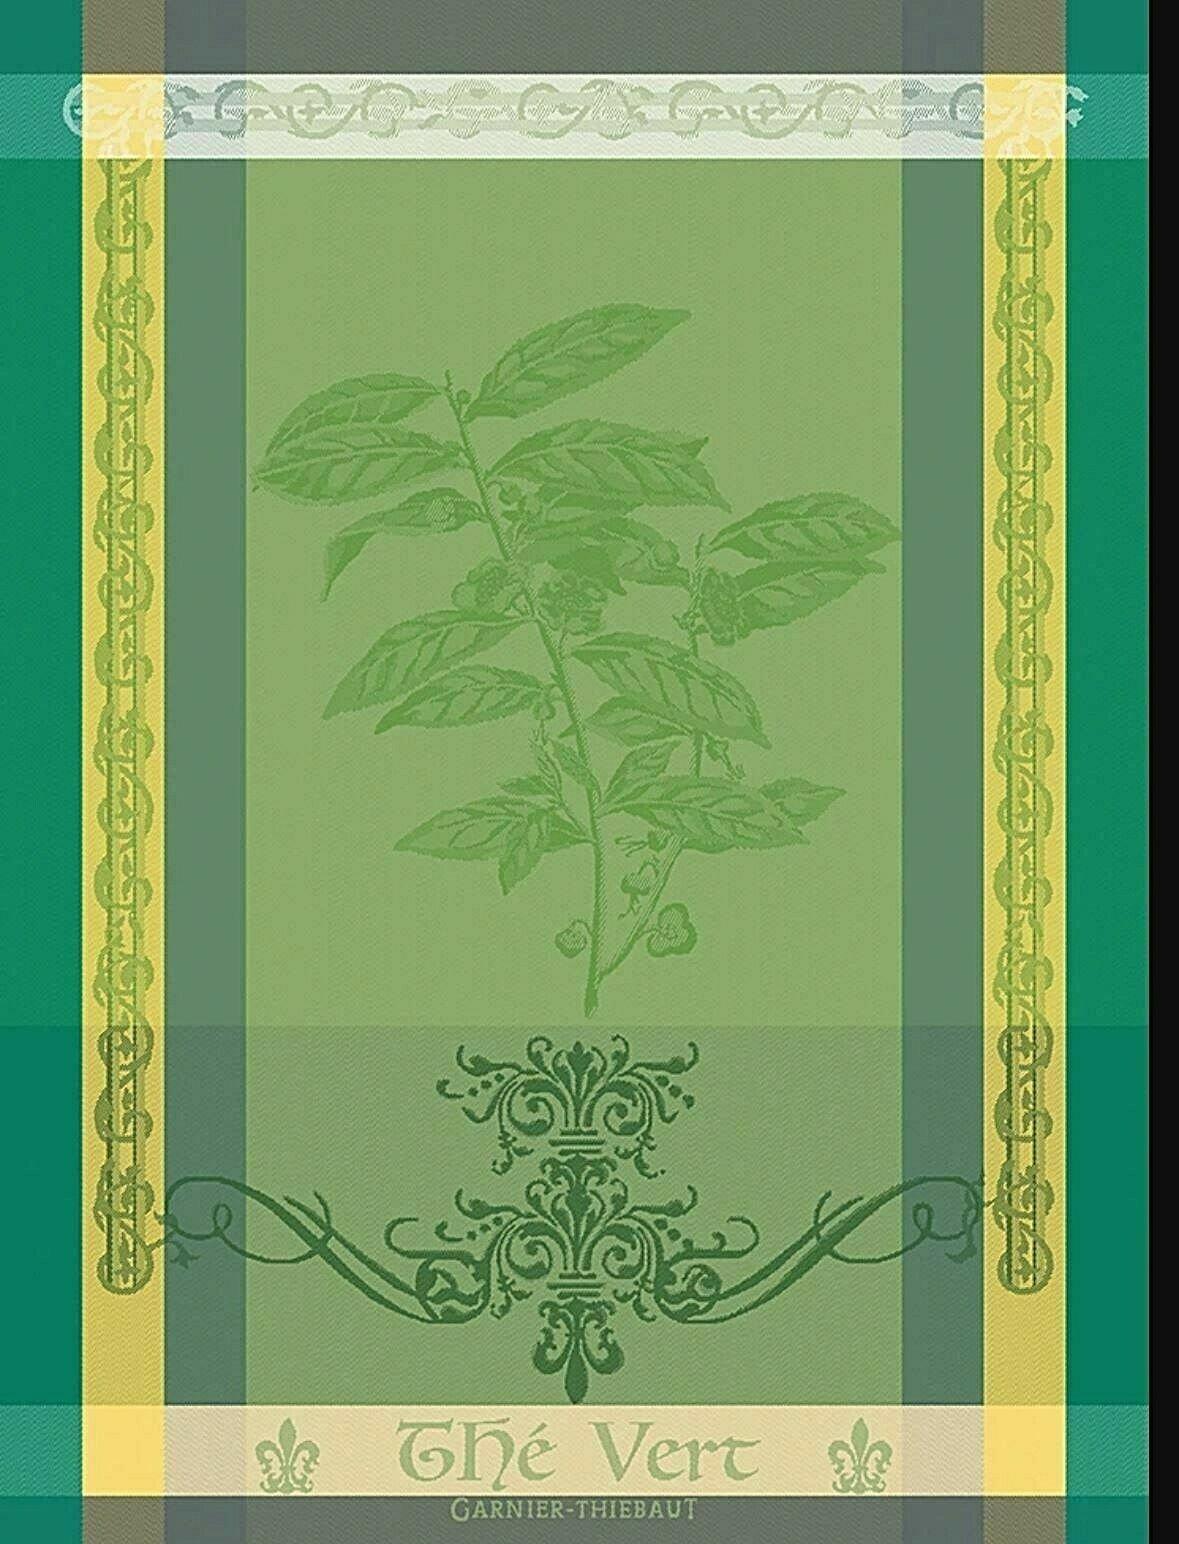 Garnier-Thiebaut Green Tea Leaf Towel